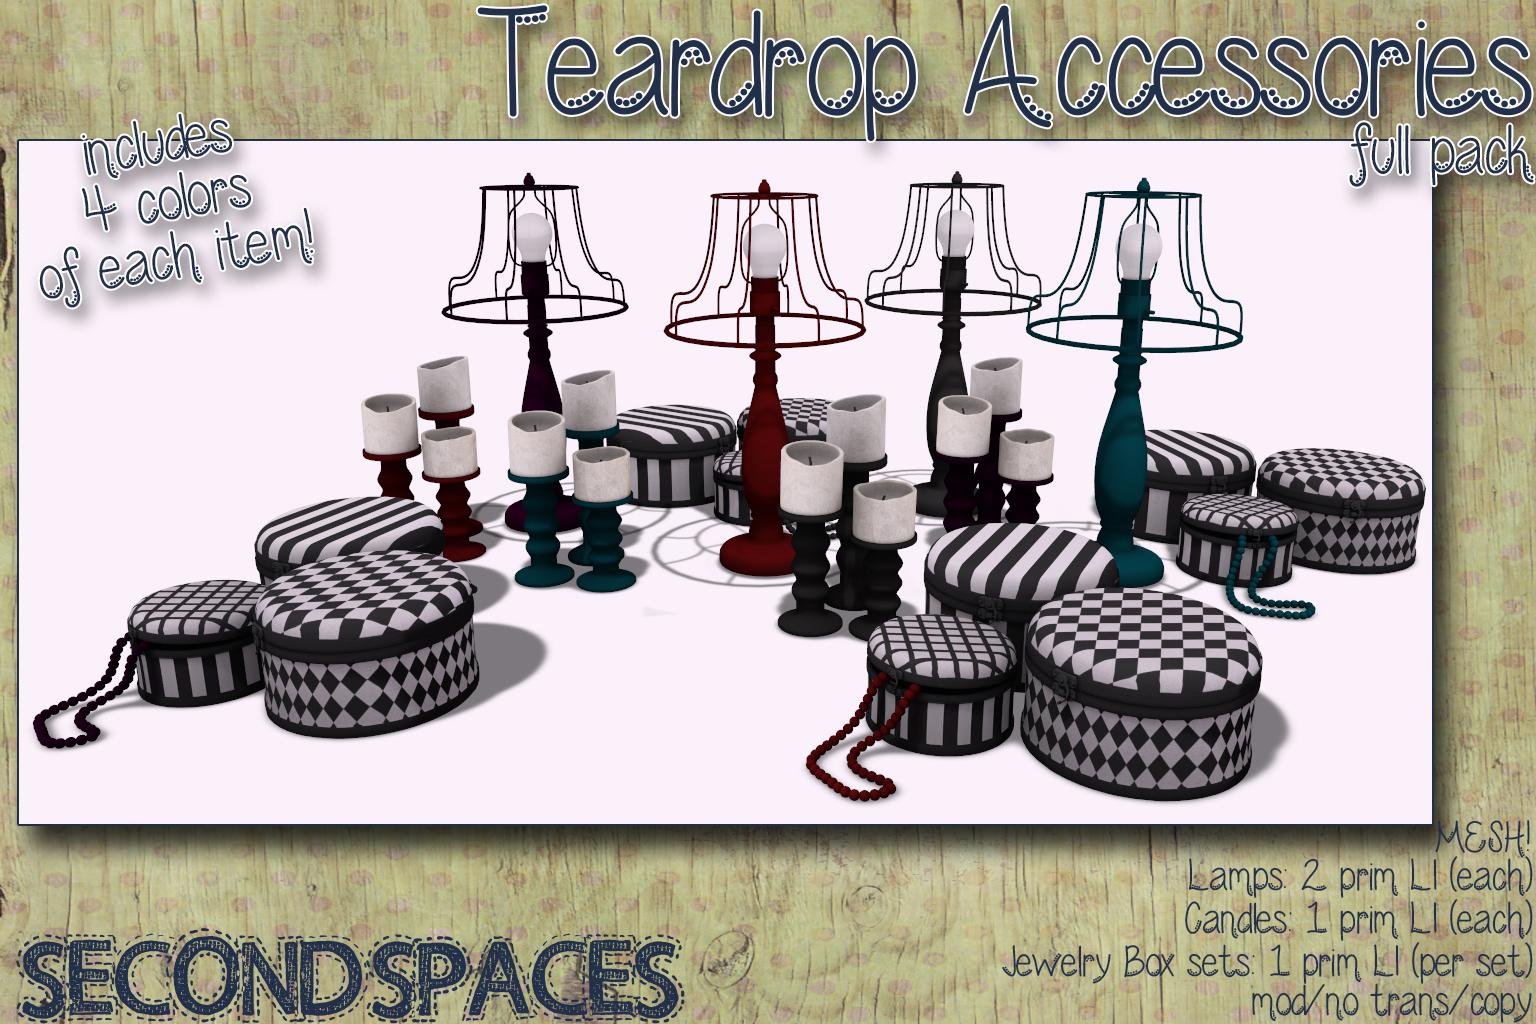 teardrop accessories_vendor.jpg